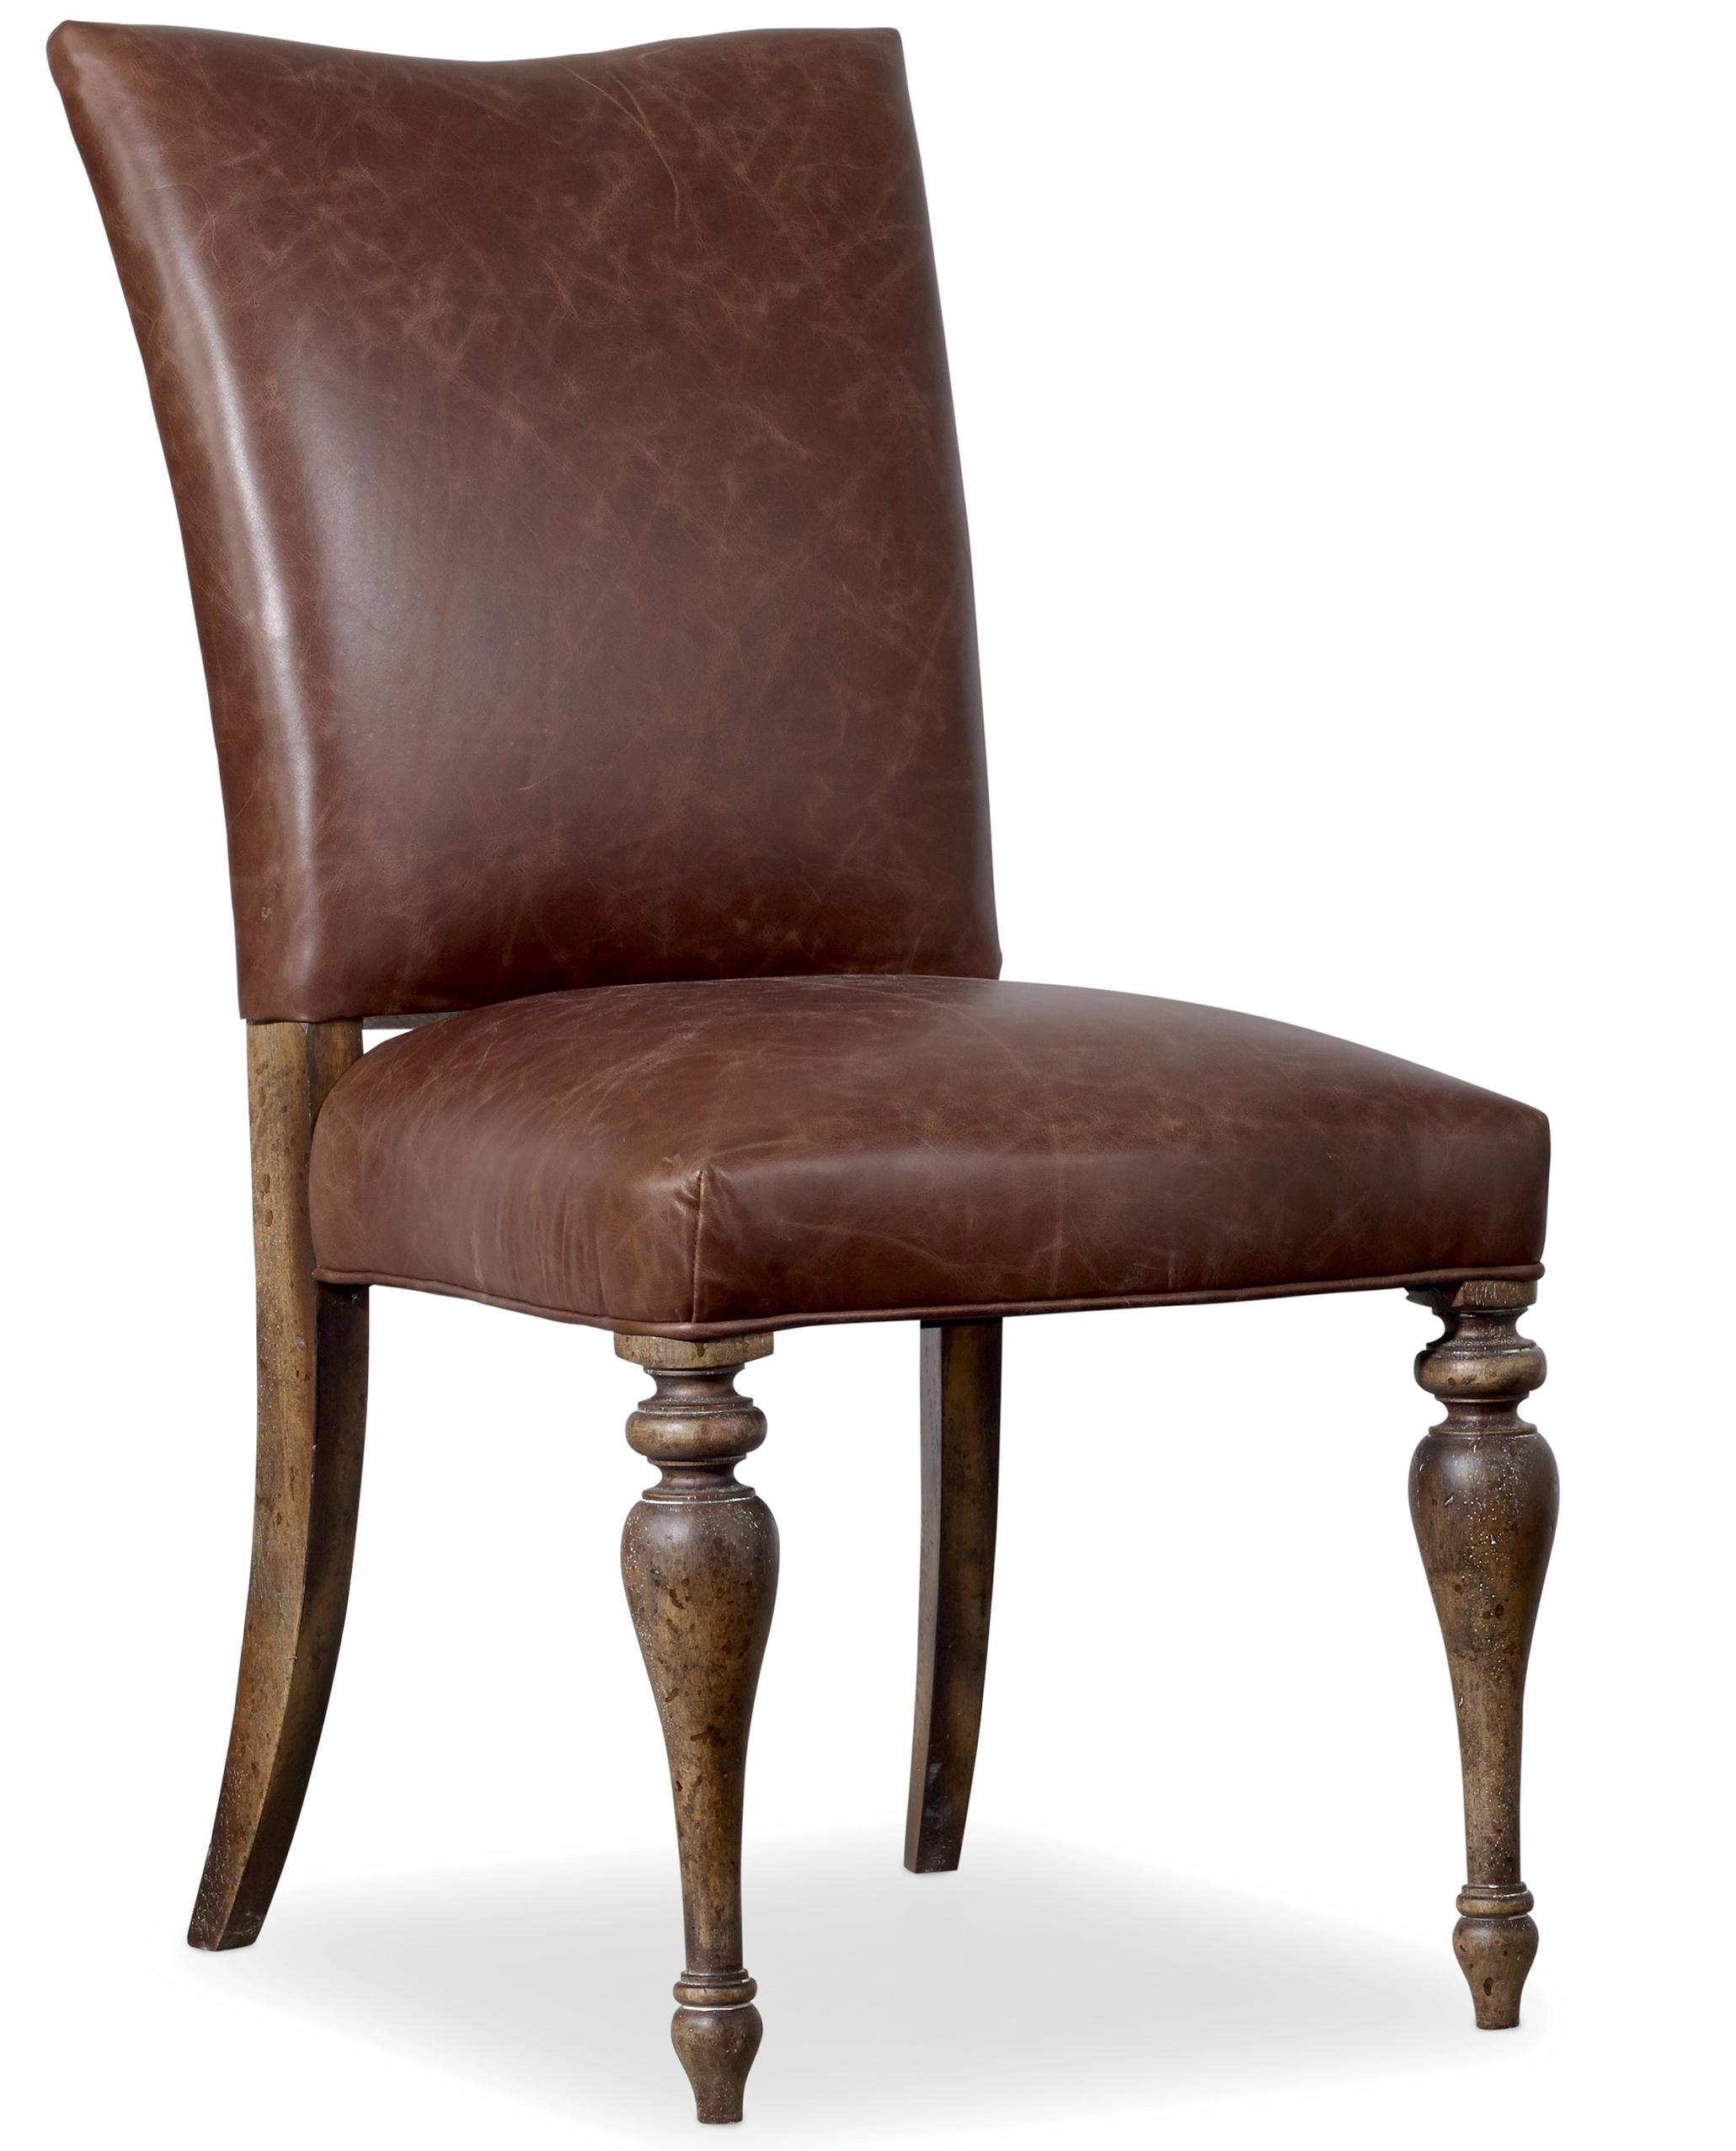 Hooker Furniture Willow Bend Upholstered Leather Side